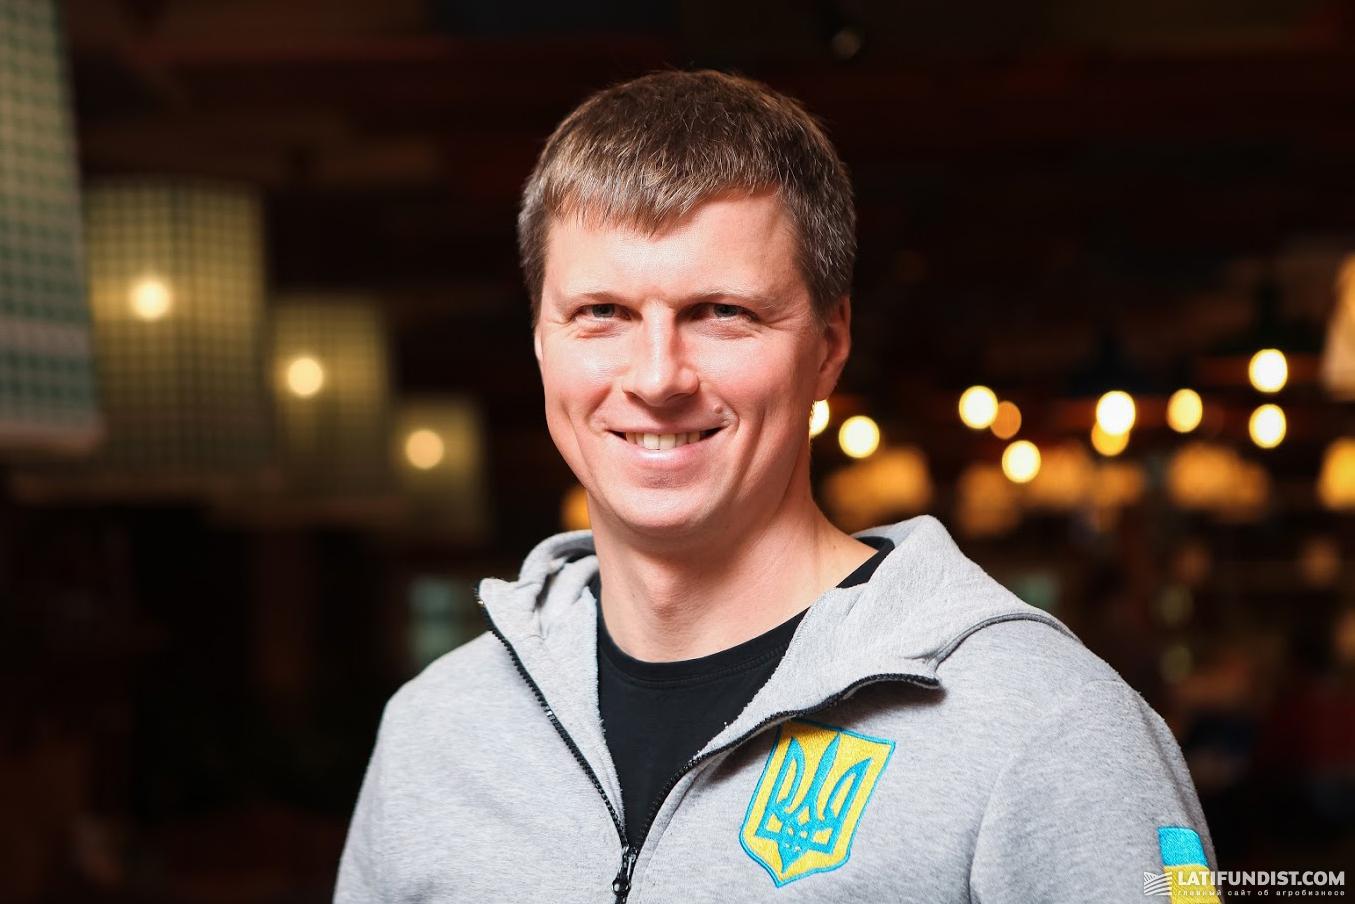 Алексей Мушак, активист земельной реформы, депутат парламента VIII созыва